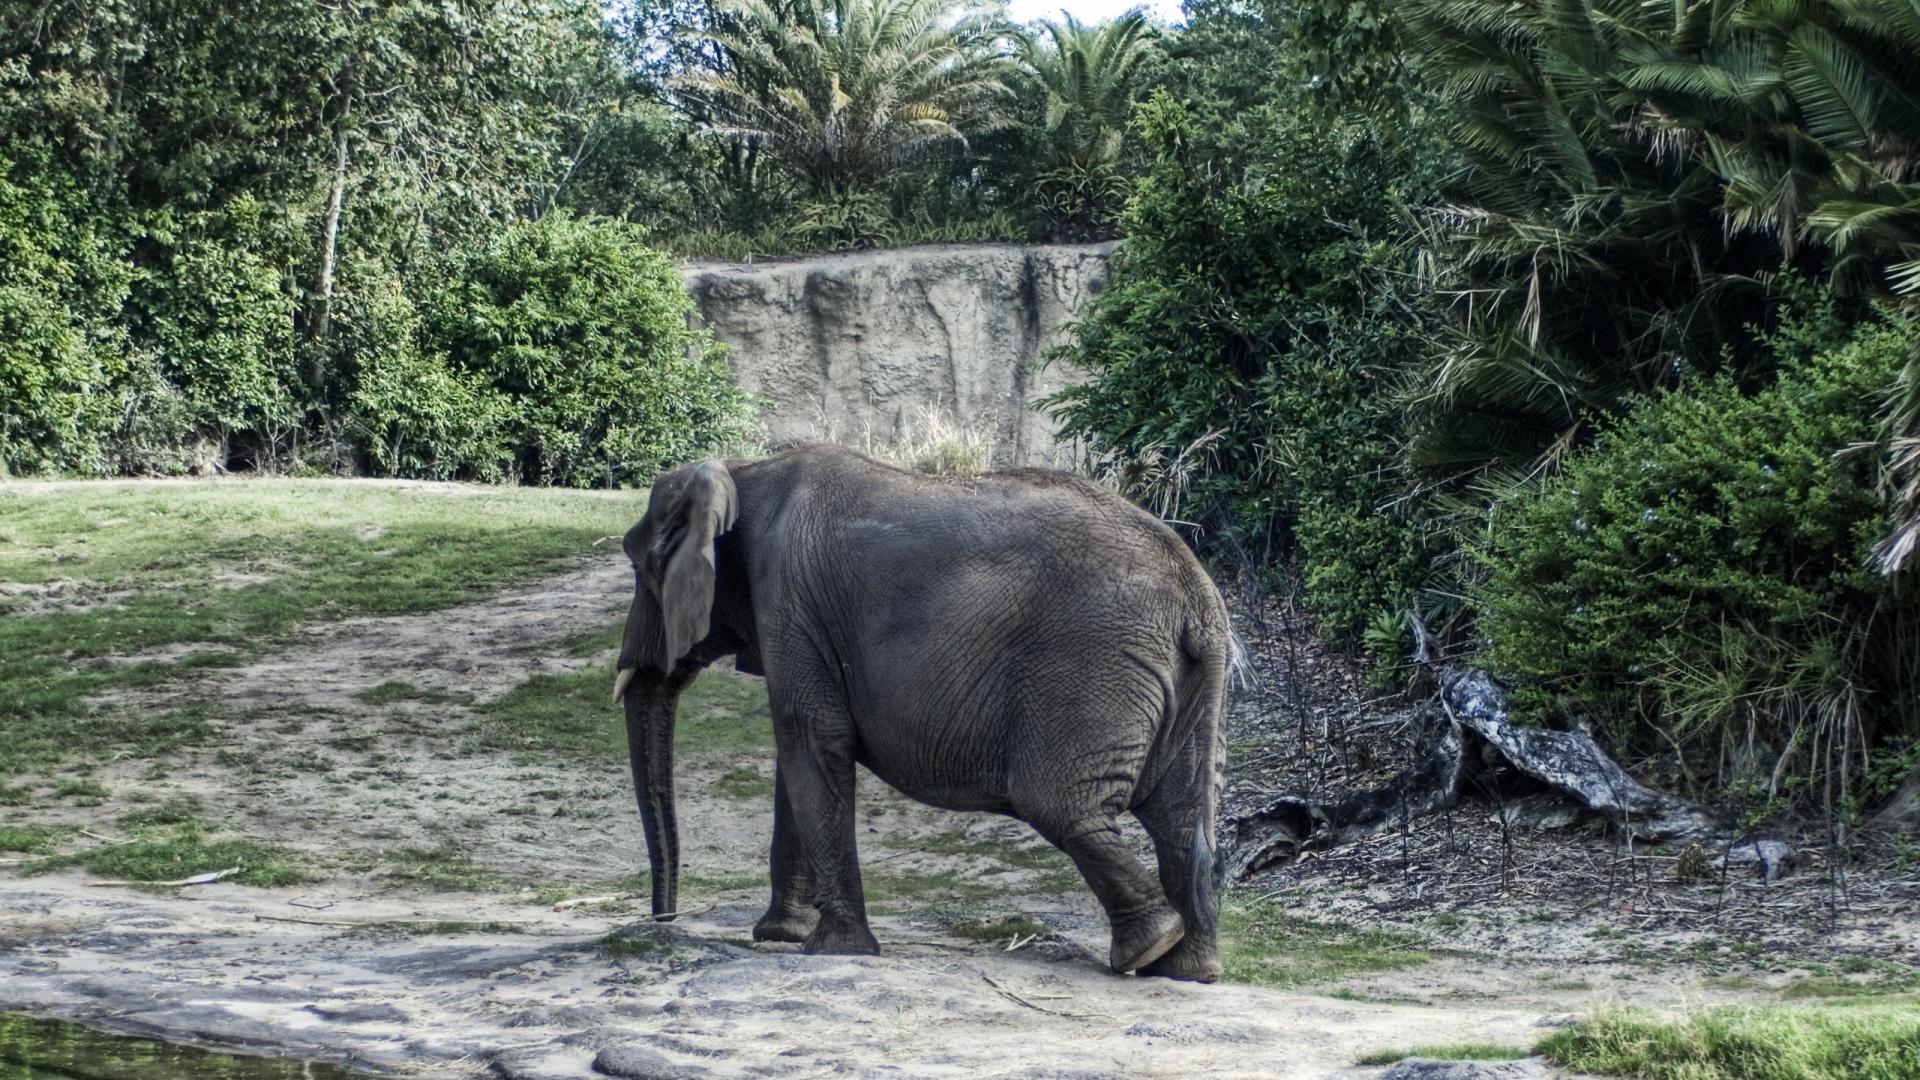 Download Wallpaper 1920x1080 elephant, large, walk, trees ...